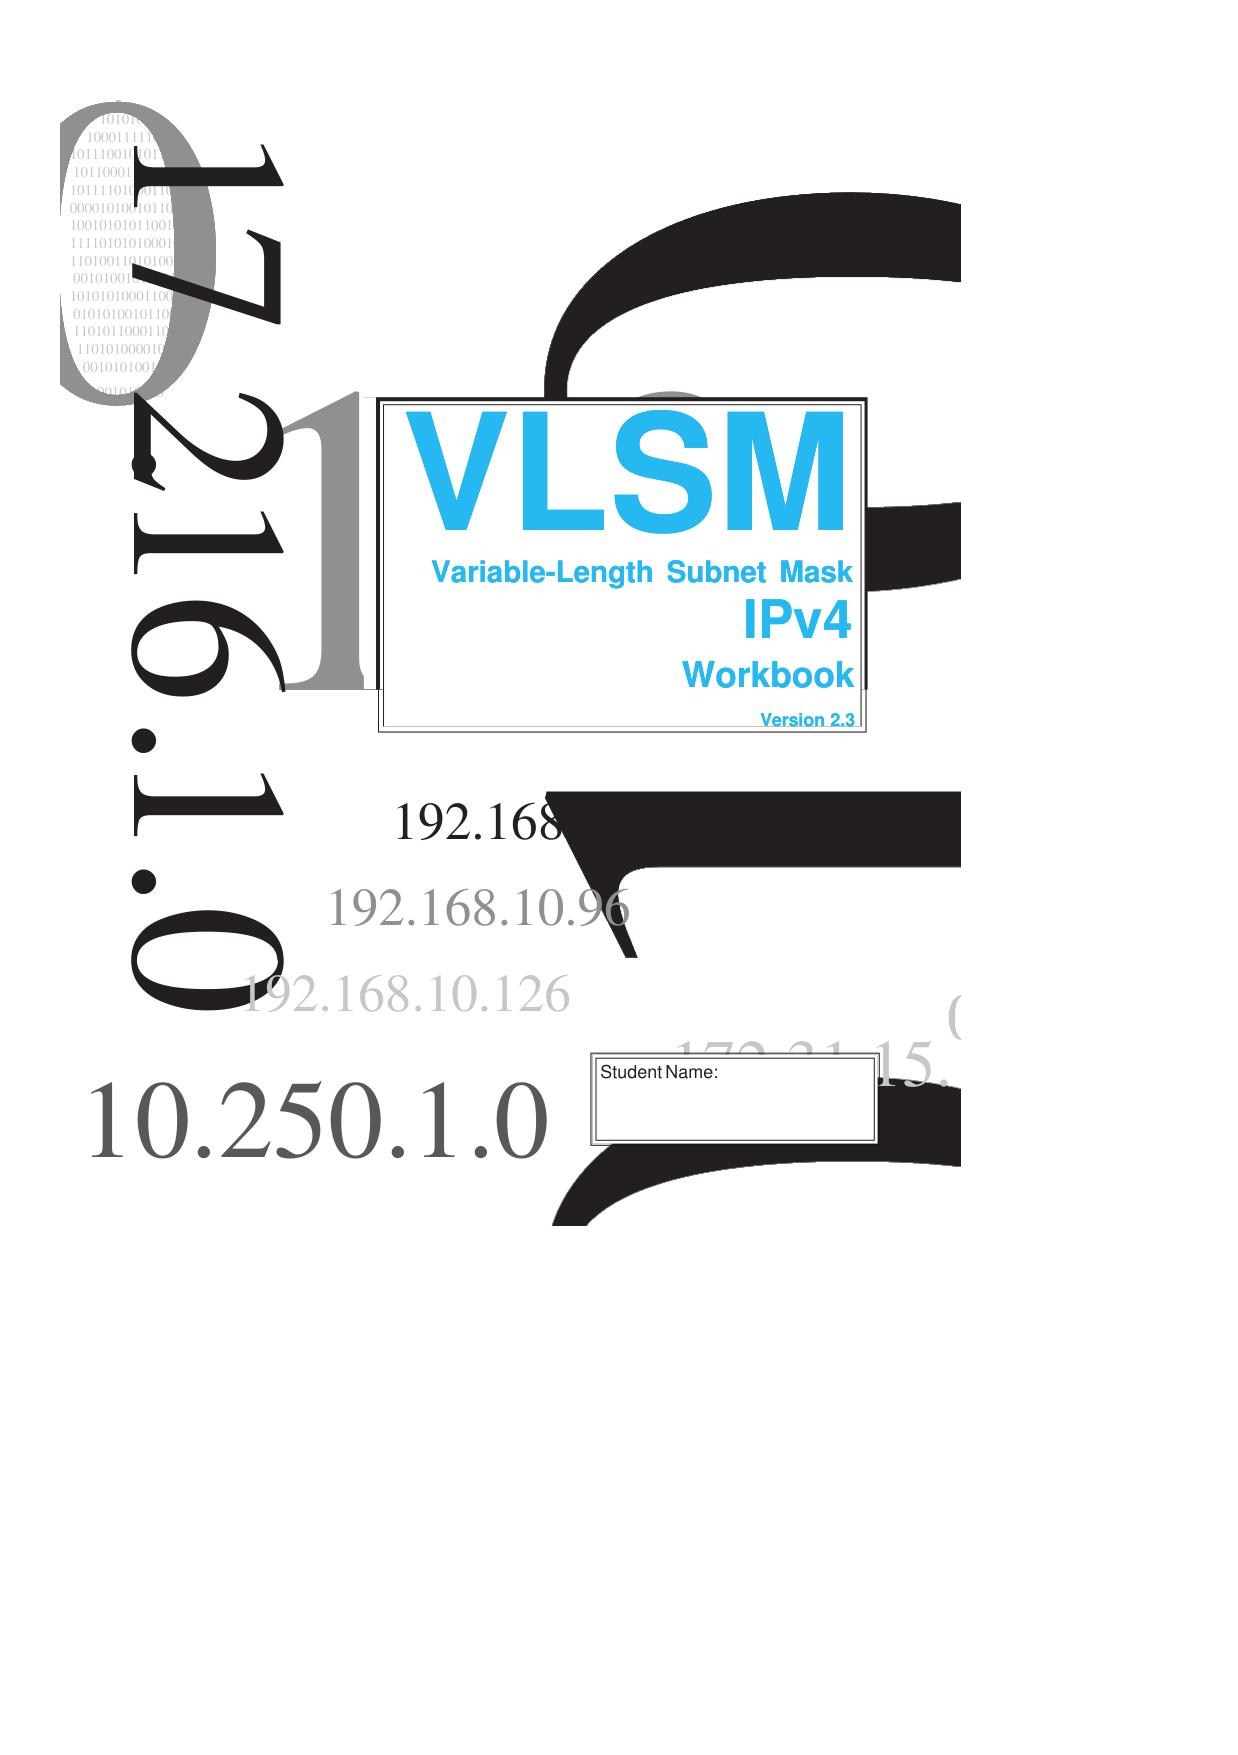 Vlsm Workbook Ipv4 Student Edition Ver 2 3